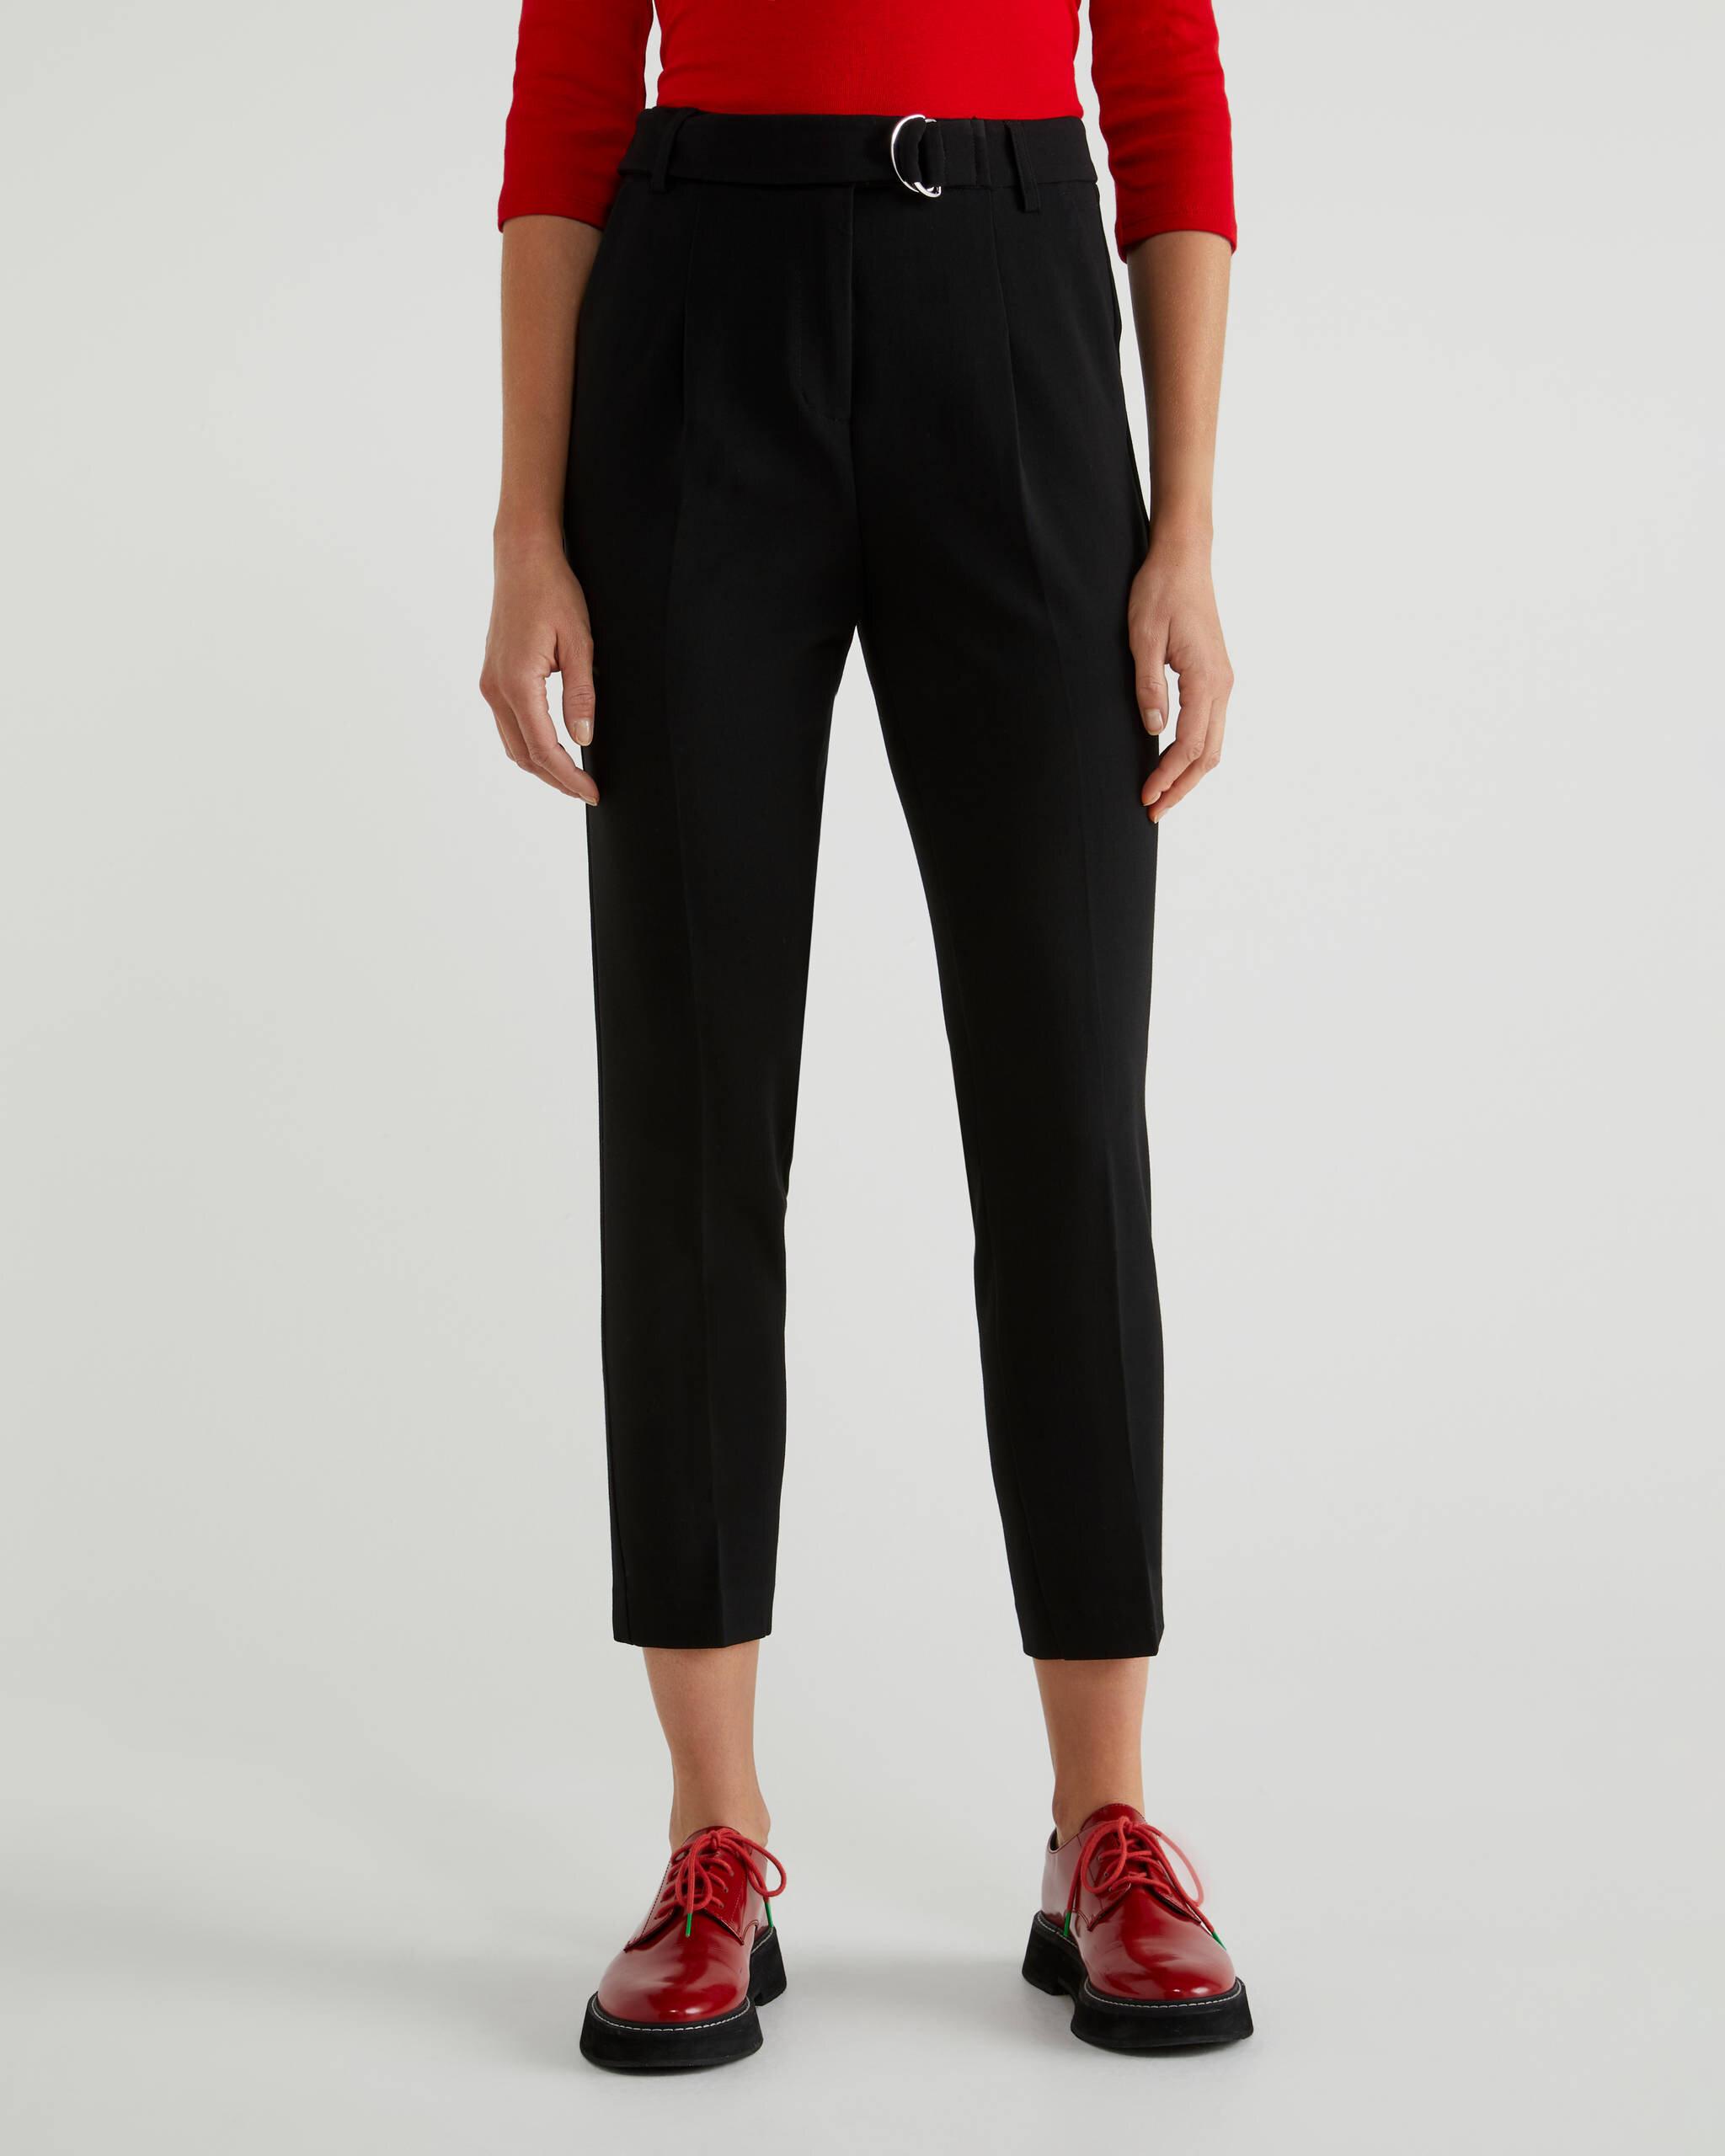 Kemer Detaylı Formal Pantolon